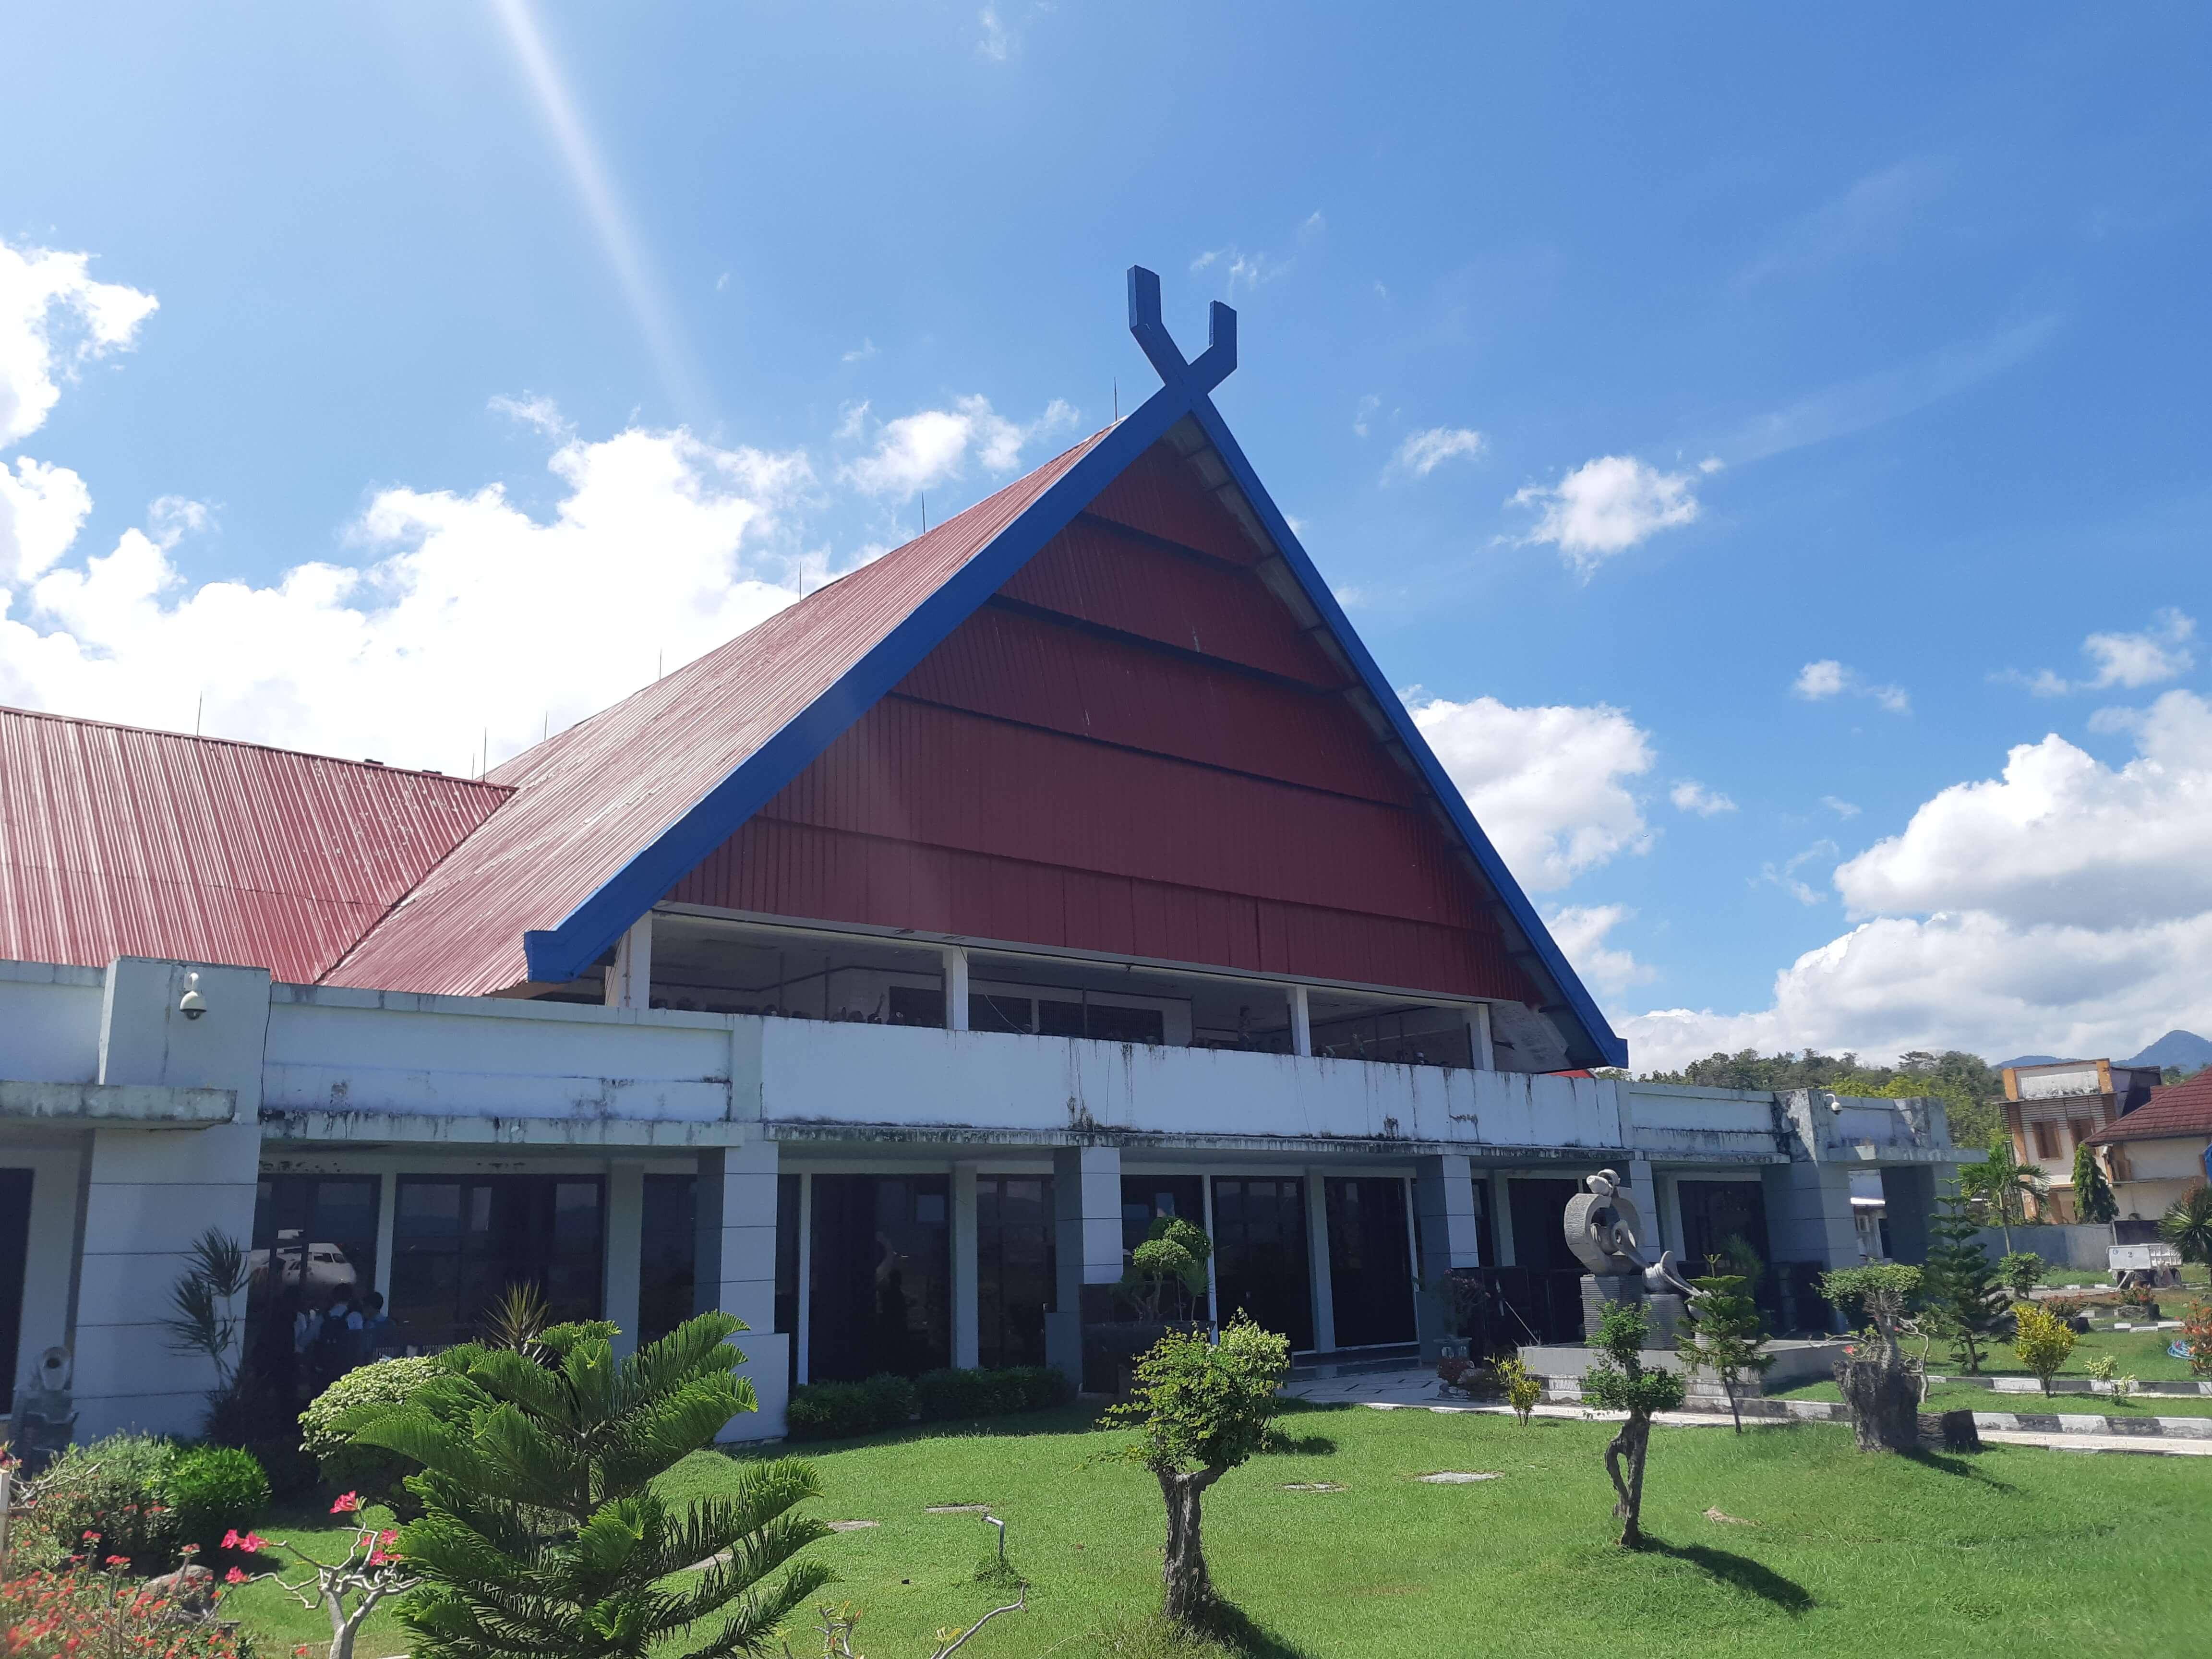 Animo Peserta Lelang Bangunan Gedung Bandara Sultan Muhammad Salahuddin Bima Tinggi, Kenaikan Nilai Lelang Capai 640%